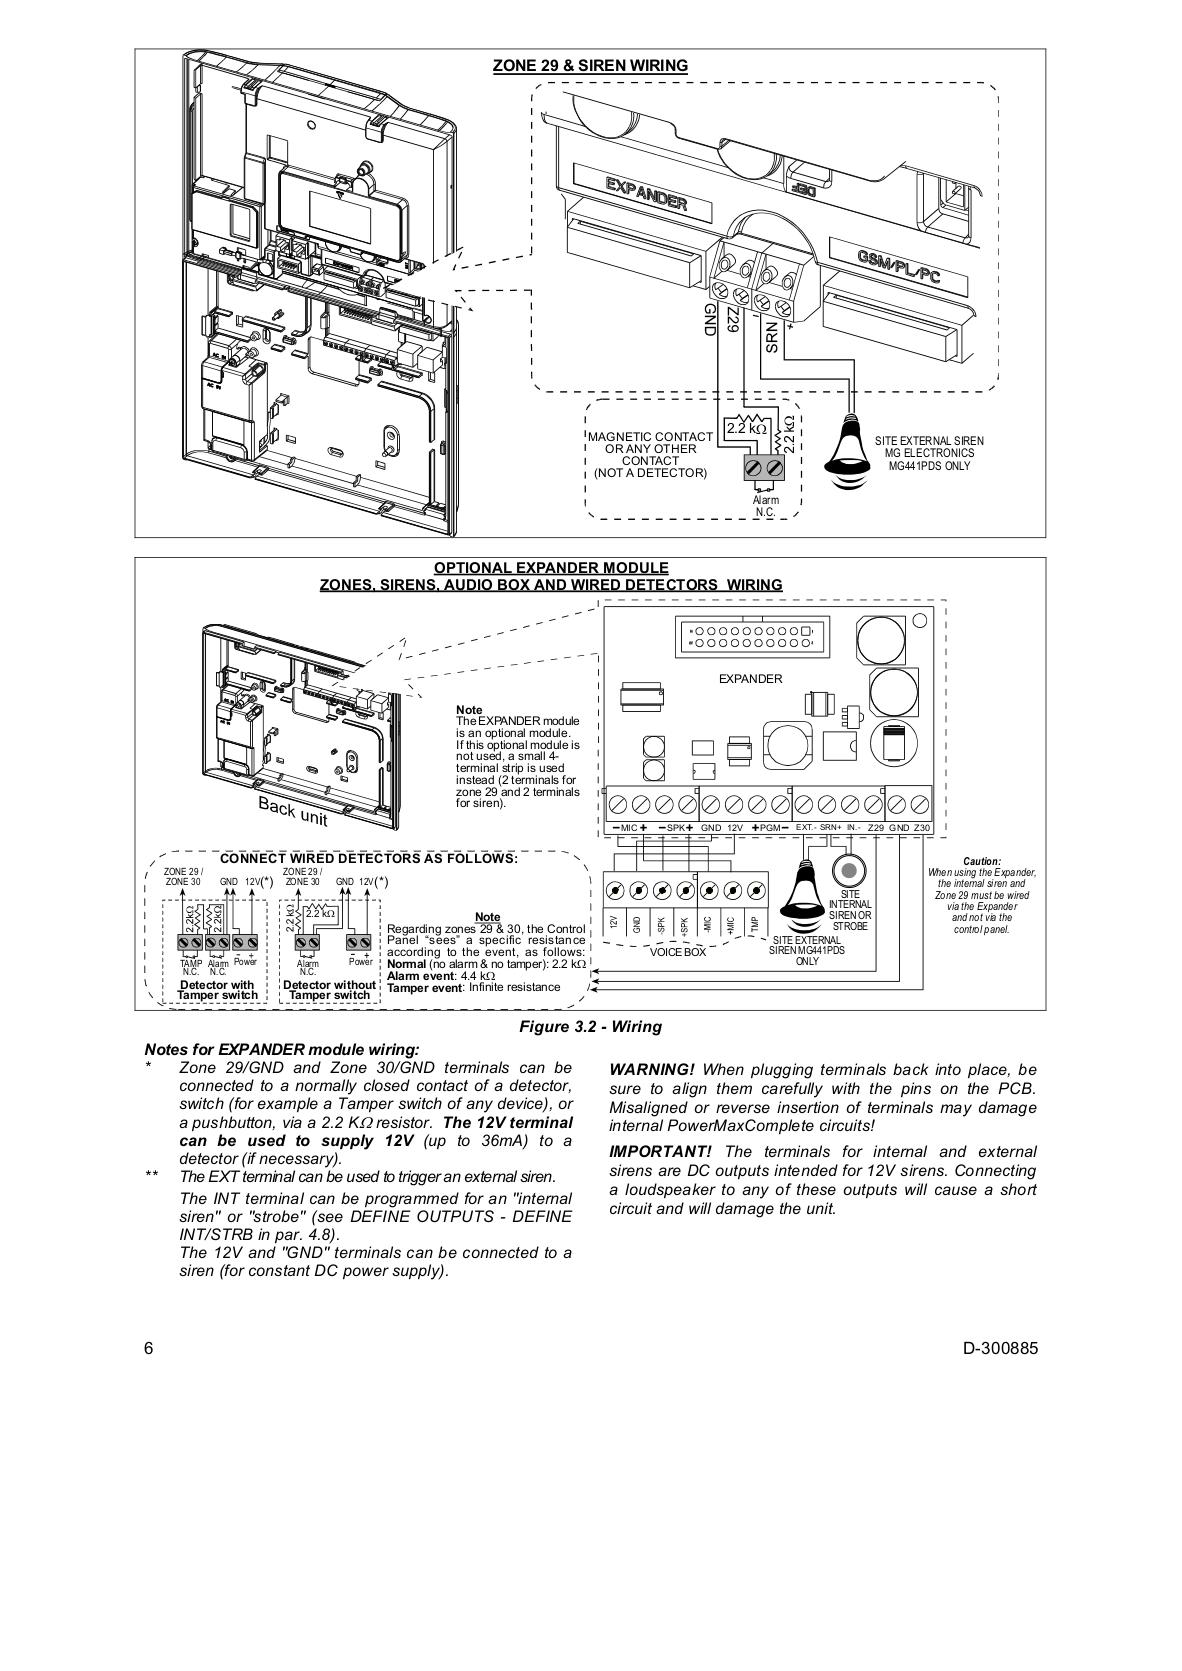 pdf manual for visonic other mkp 151 wireless keypads rh umlib com Code 3 Siren Wiring-Diagram 3 Wire Siren Wiring